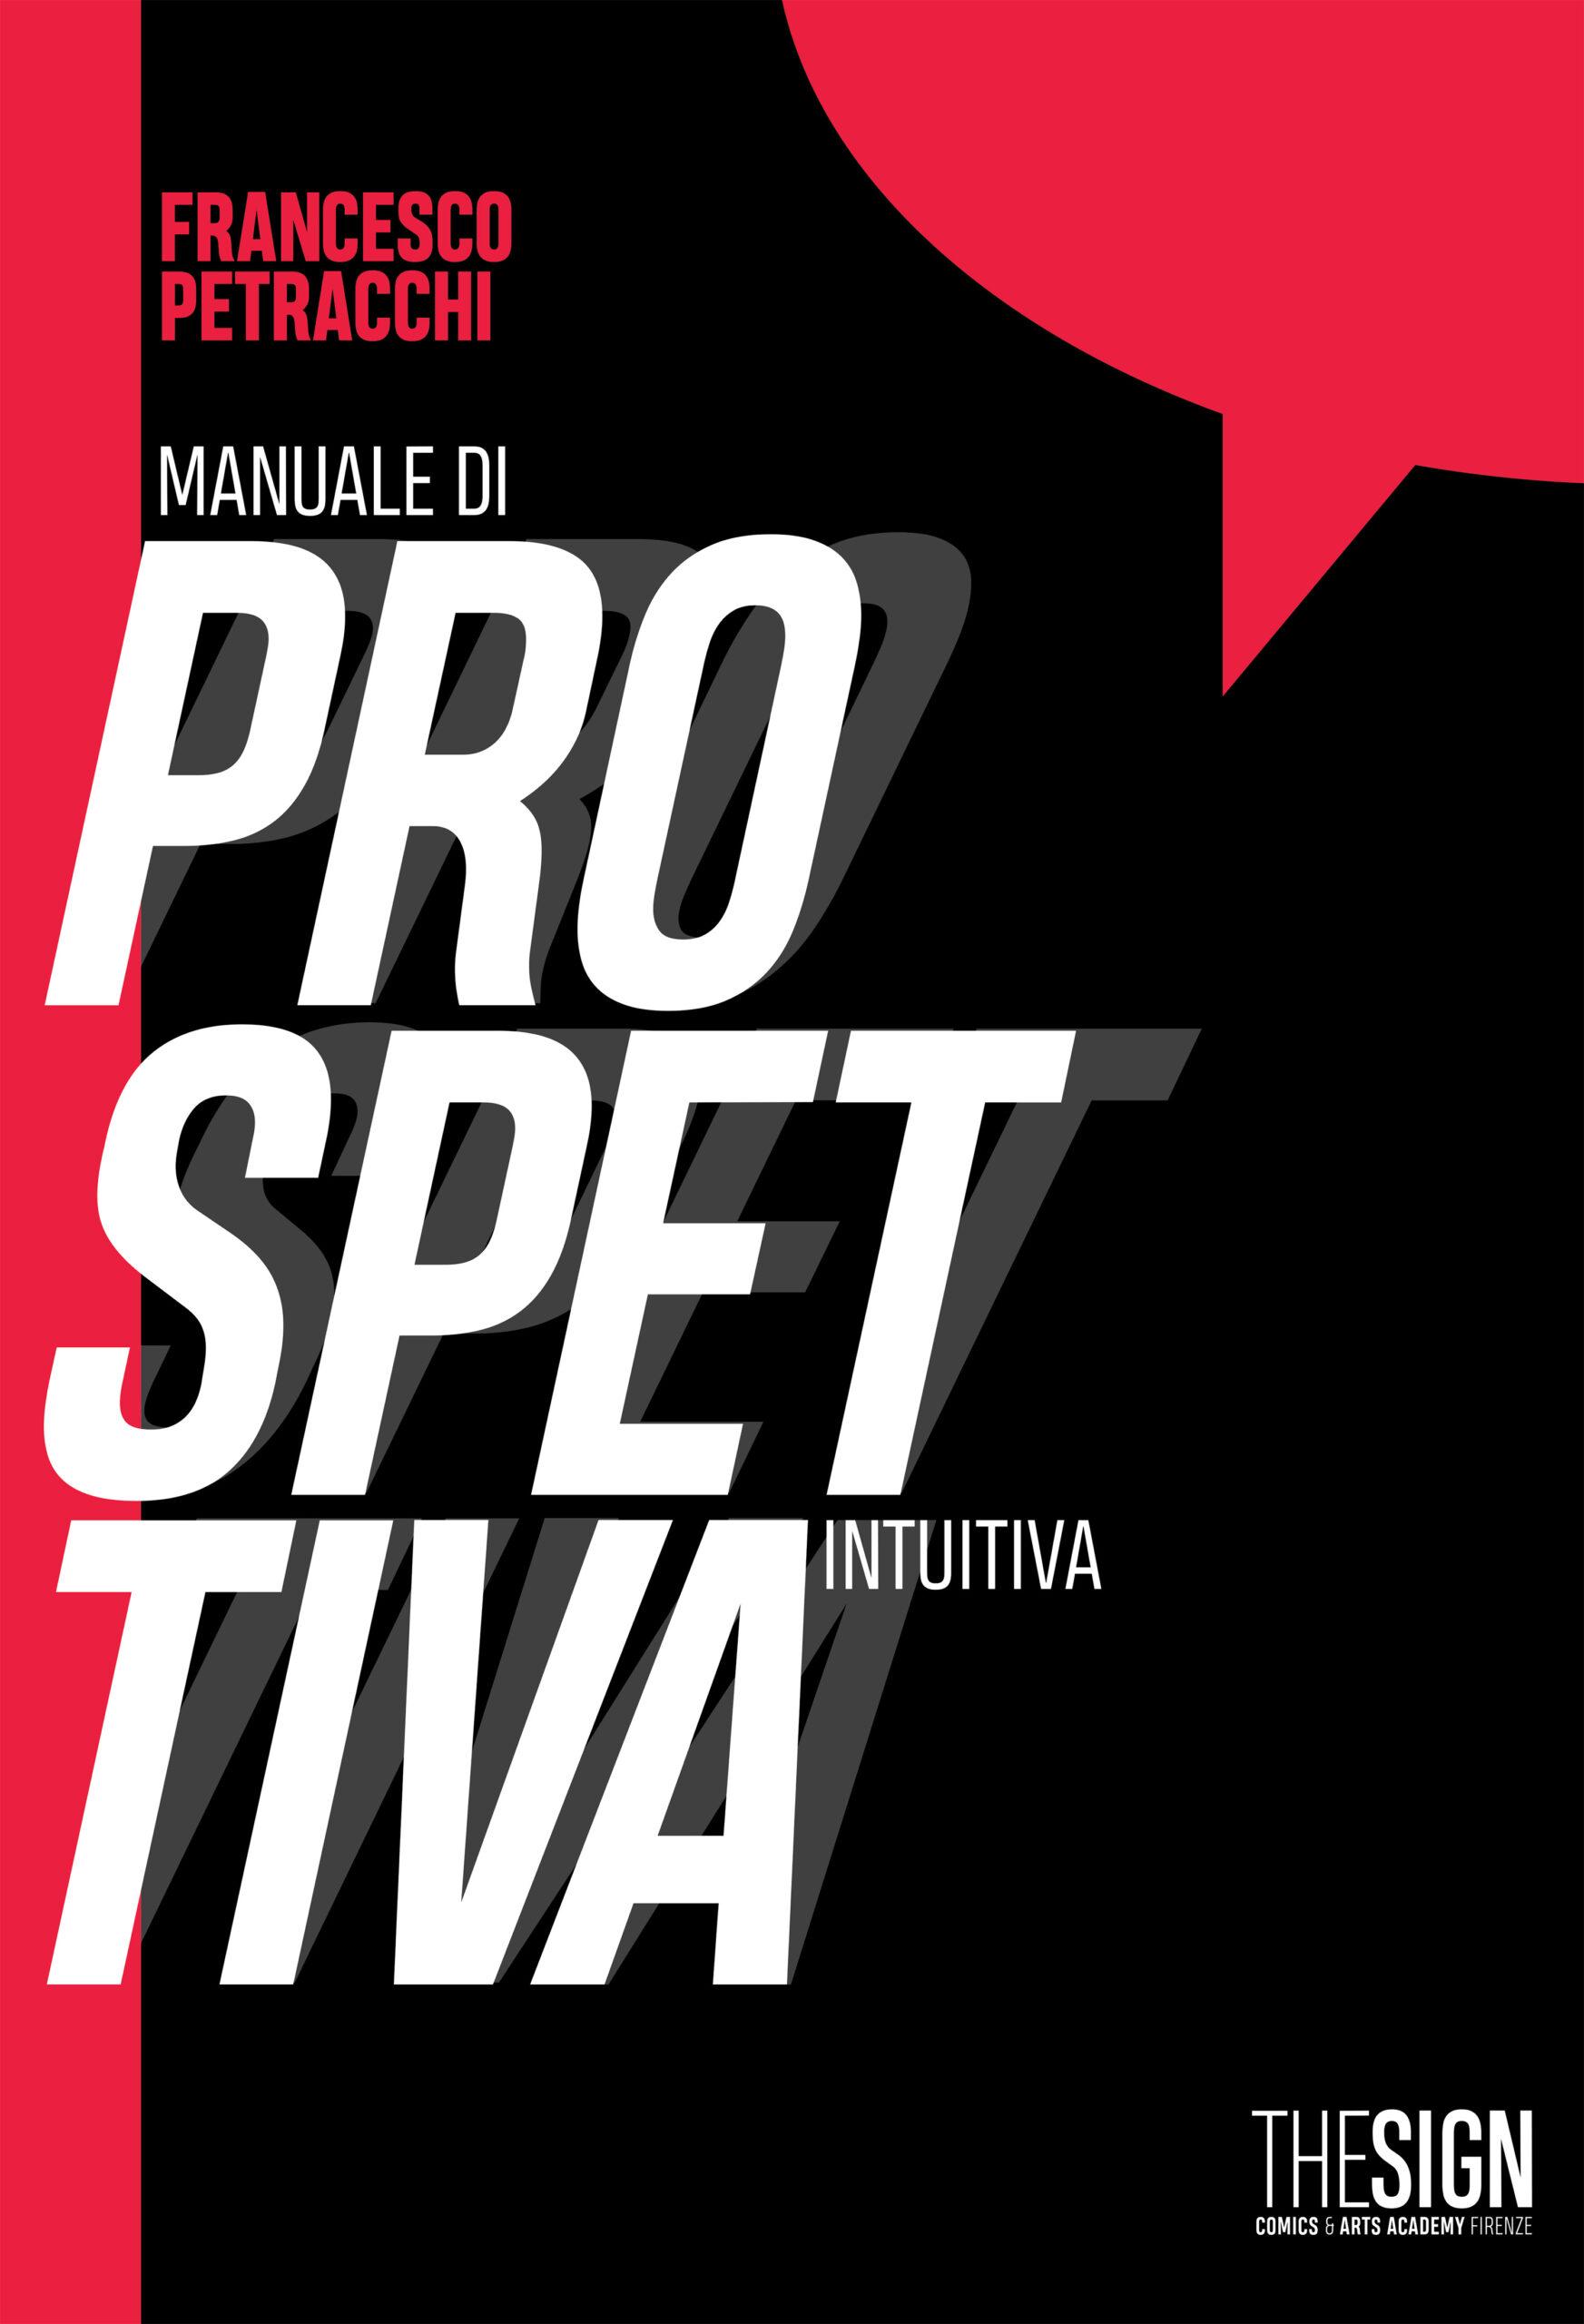 manuale prospettiva